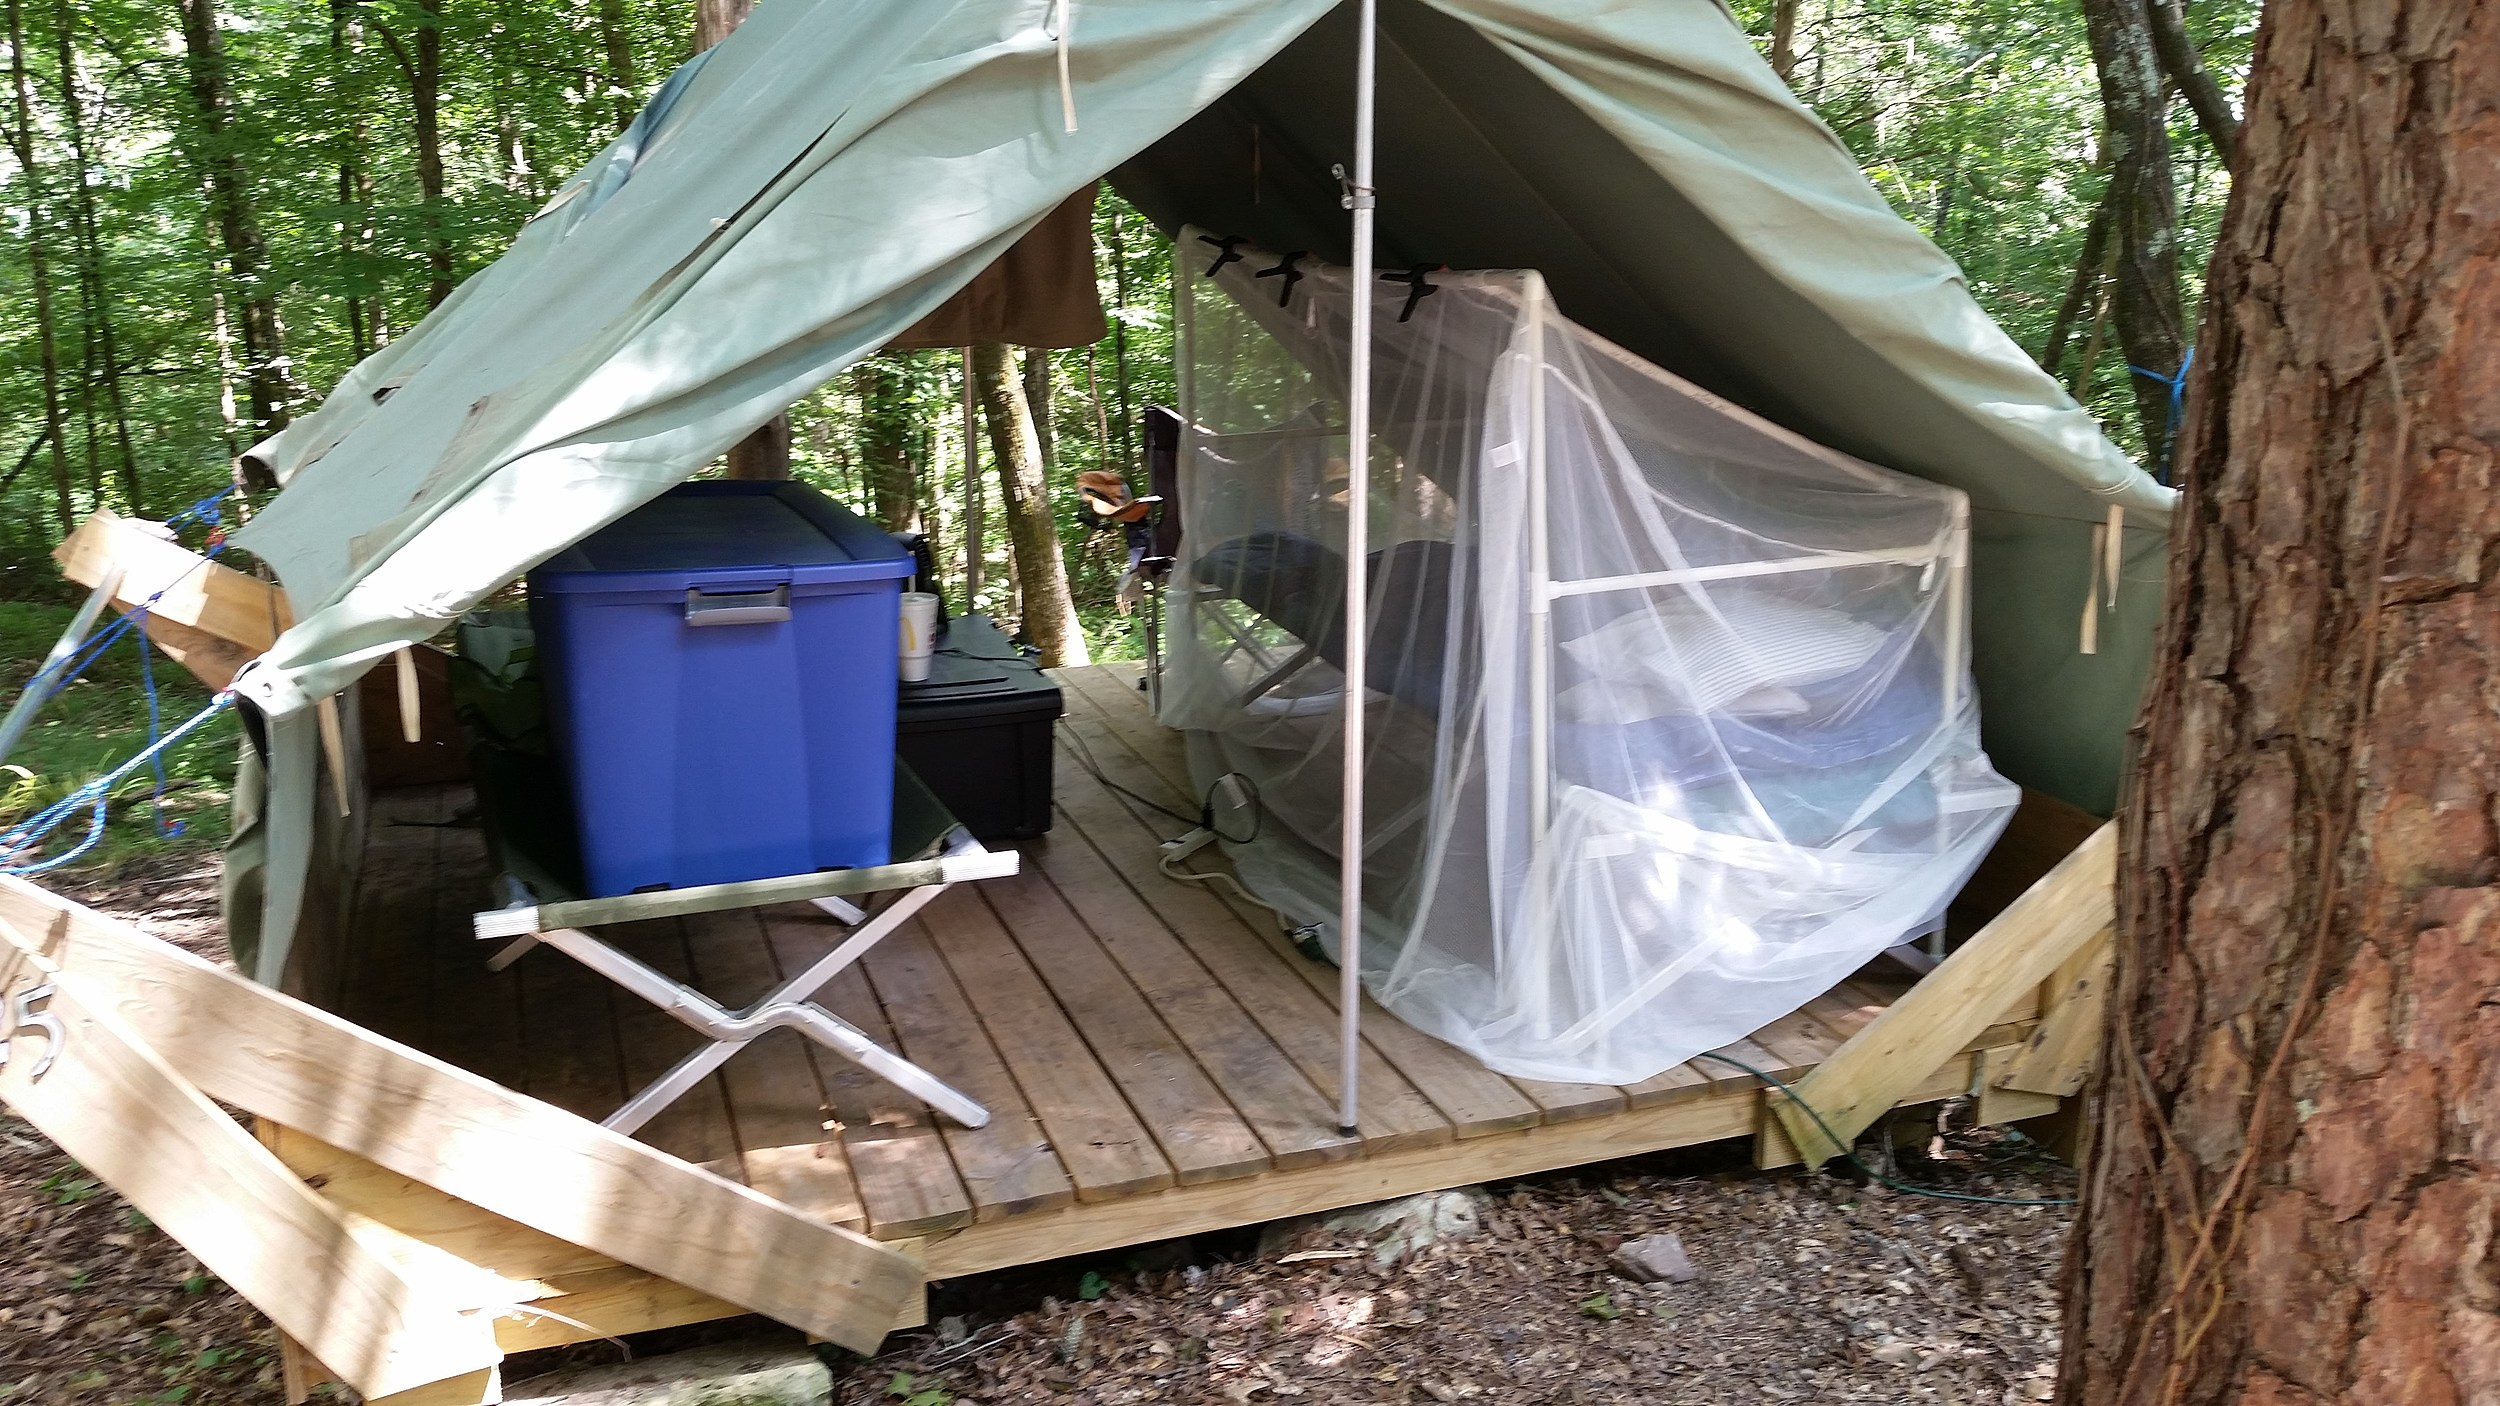 UPDATE Mosquito Net Bed Frame For C& u2013 Jim Weaver DIY & UPDATE: Mosquito Net Bed Frame For Camp - Jim Weaver DIY